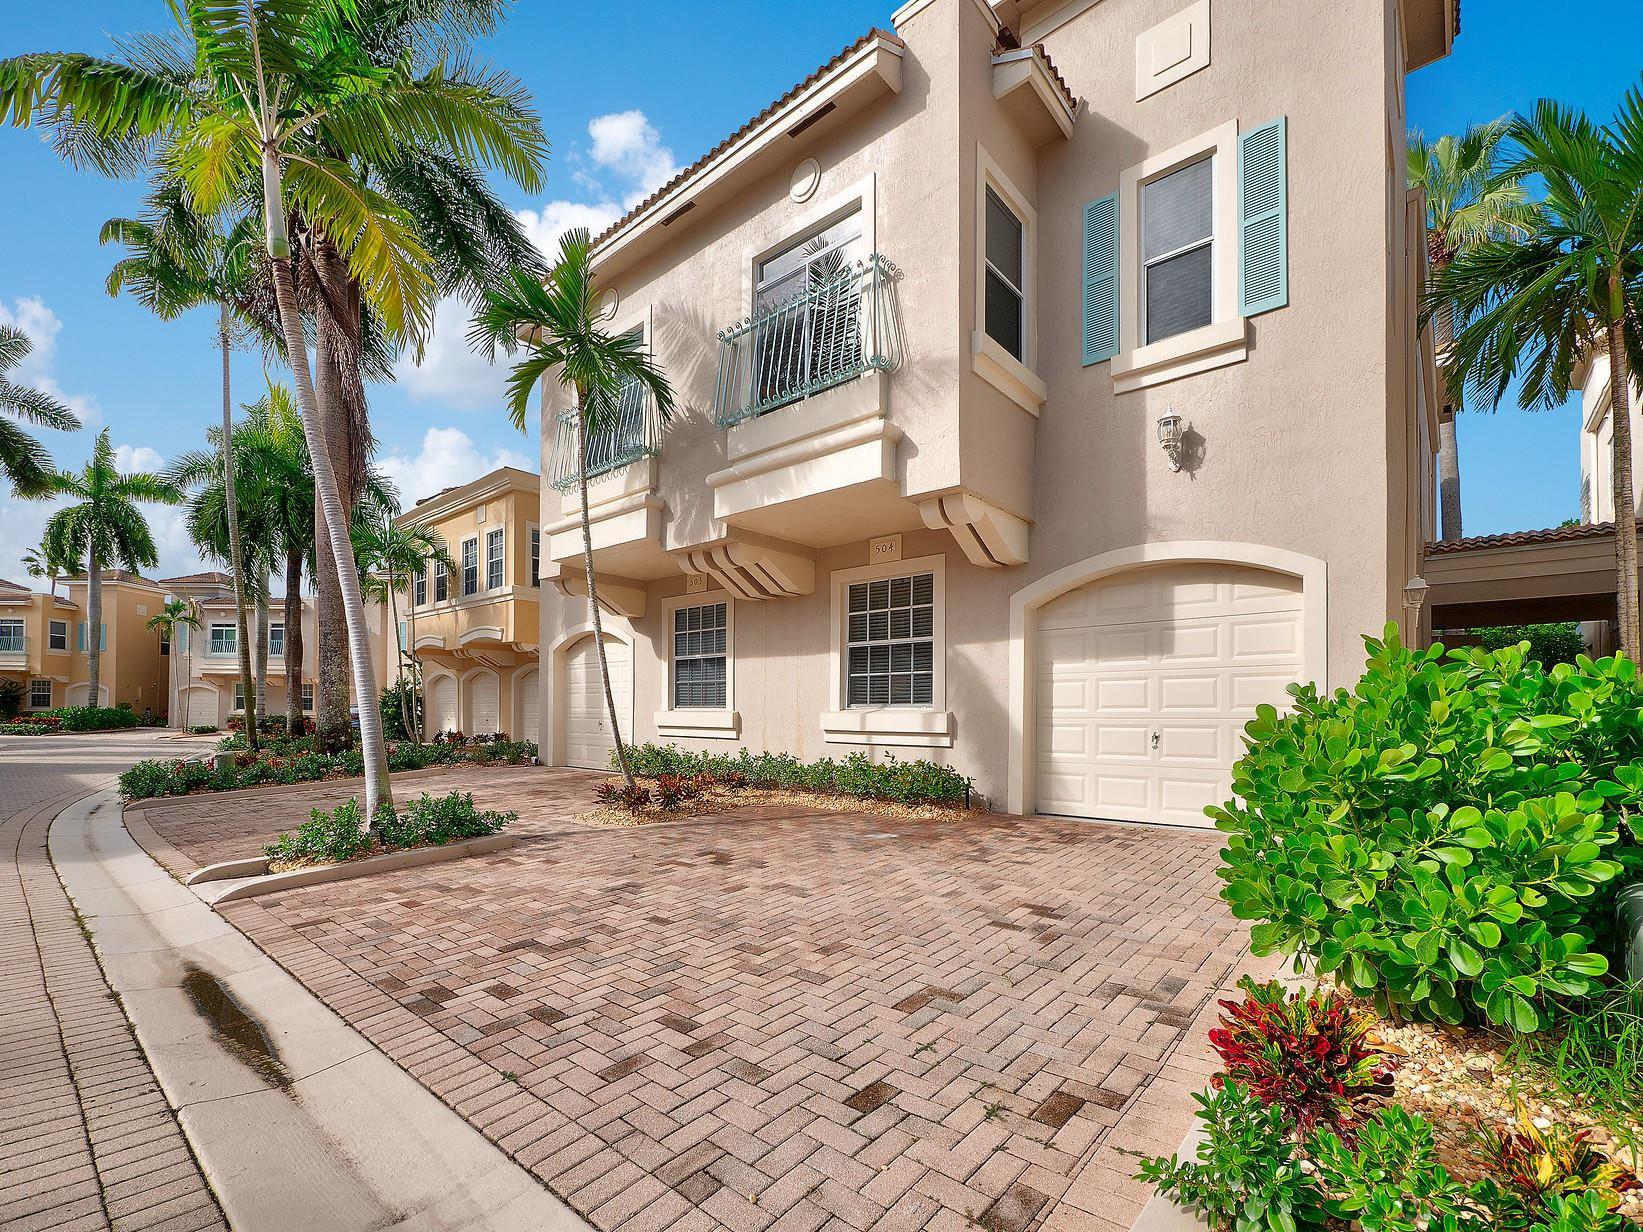 504 Resort Lane #504, Palm Beach Gardens, FL 33418 - MLS#: RX-10666008